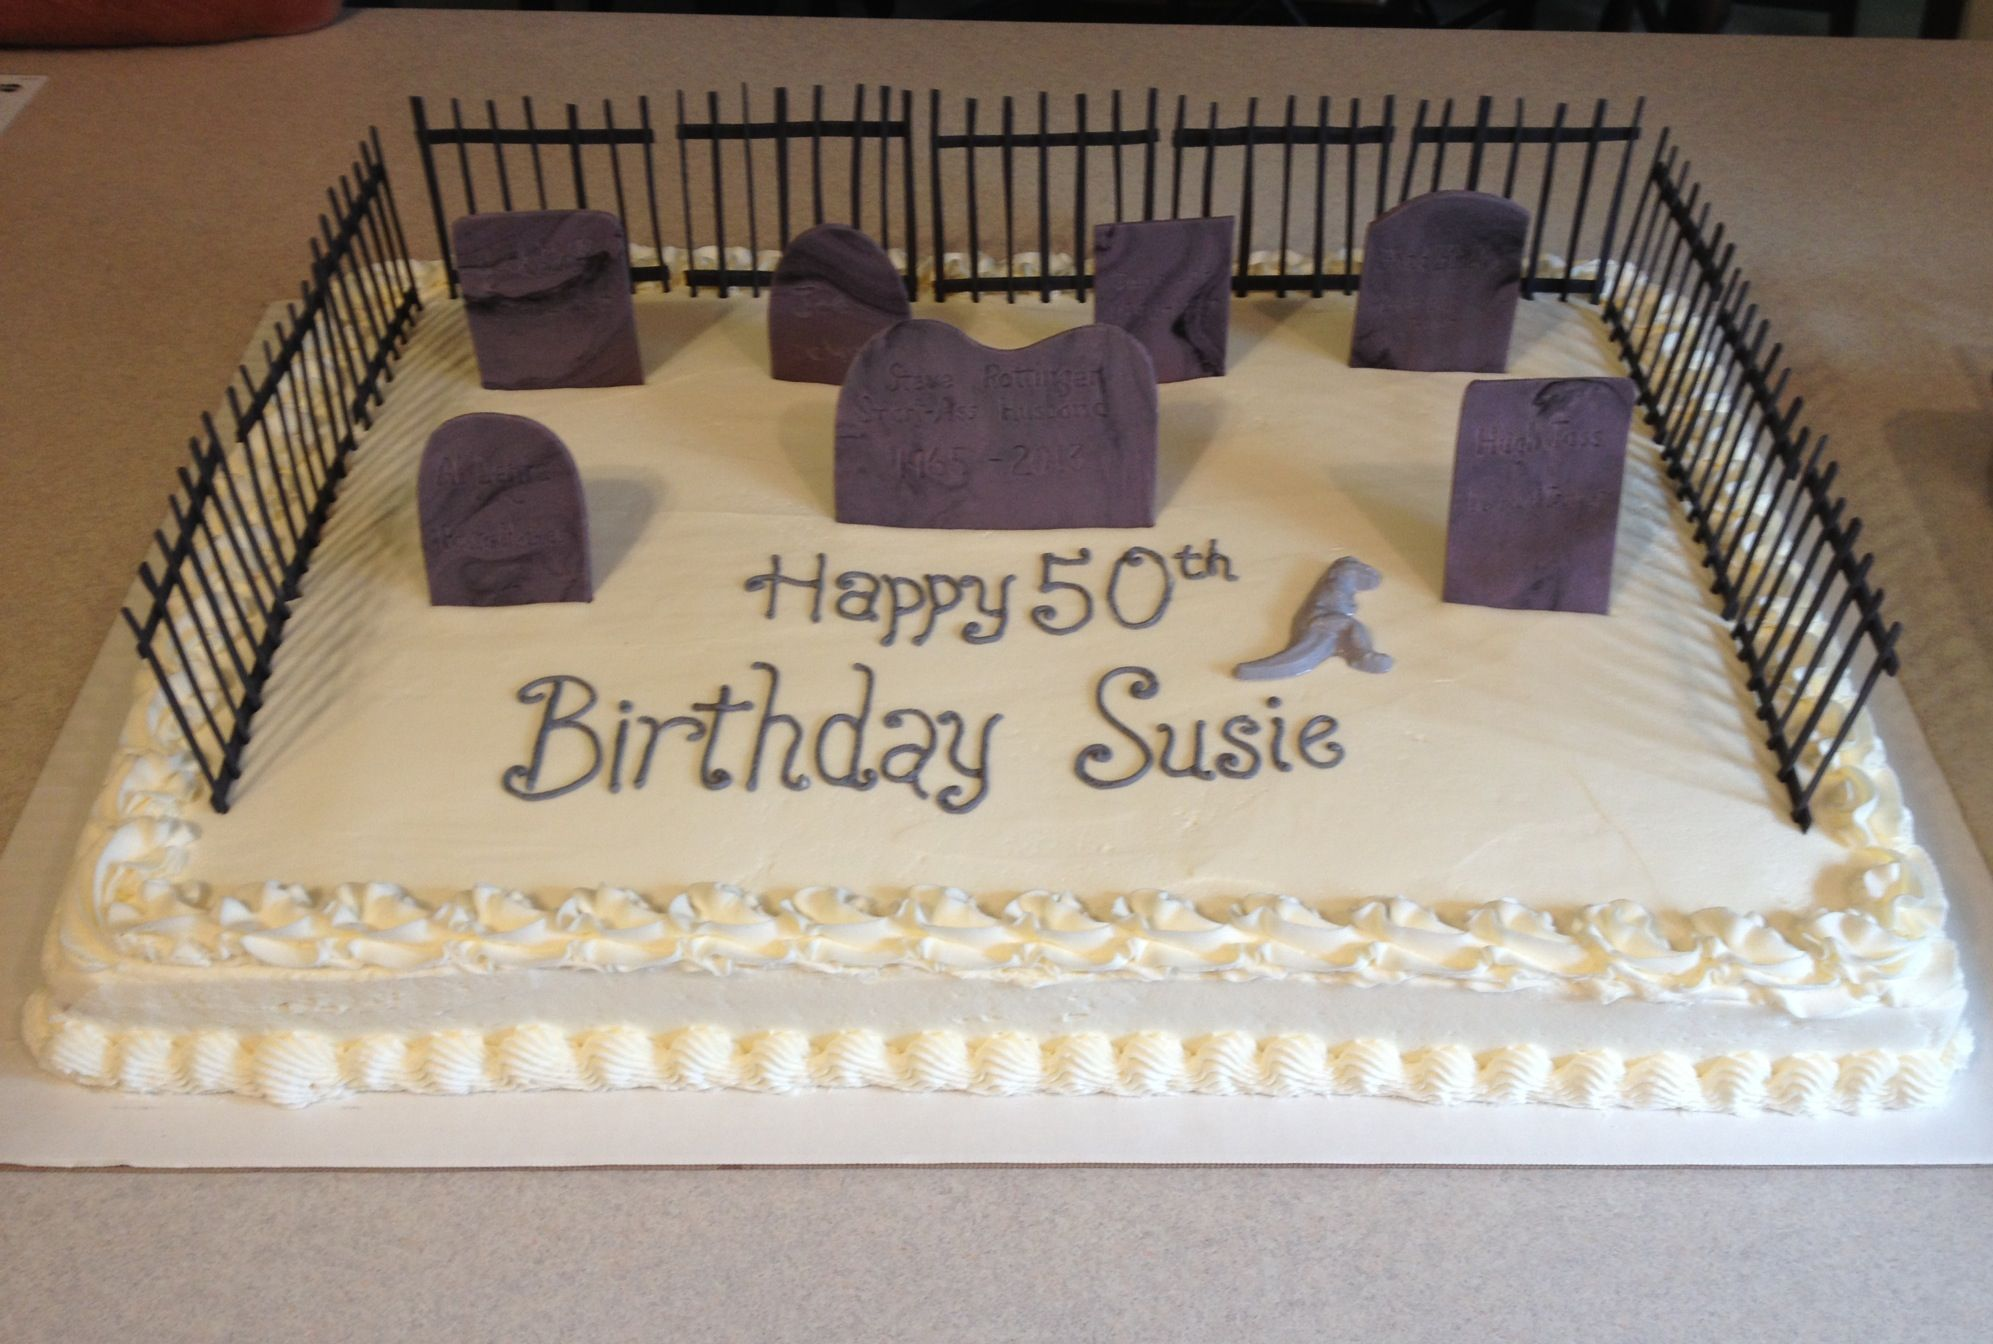 Cake Ideas For 50th Birthday Funny : Funny? 50th Birthday Cake Baking ideas Pinterest